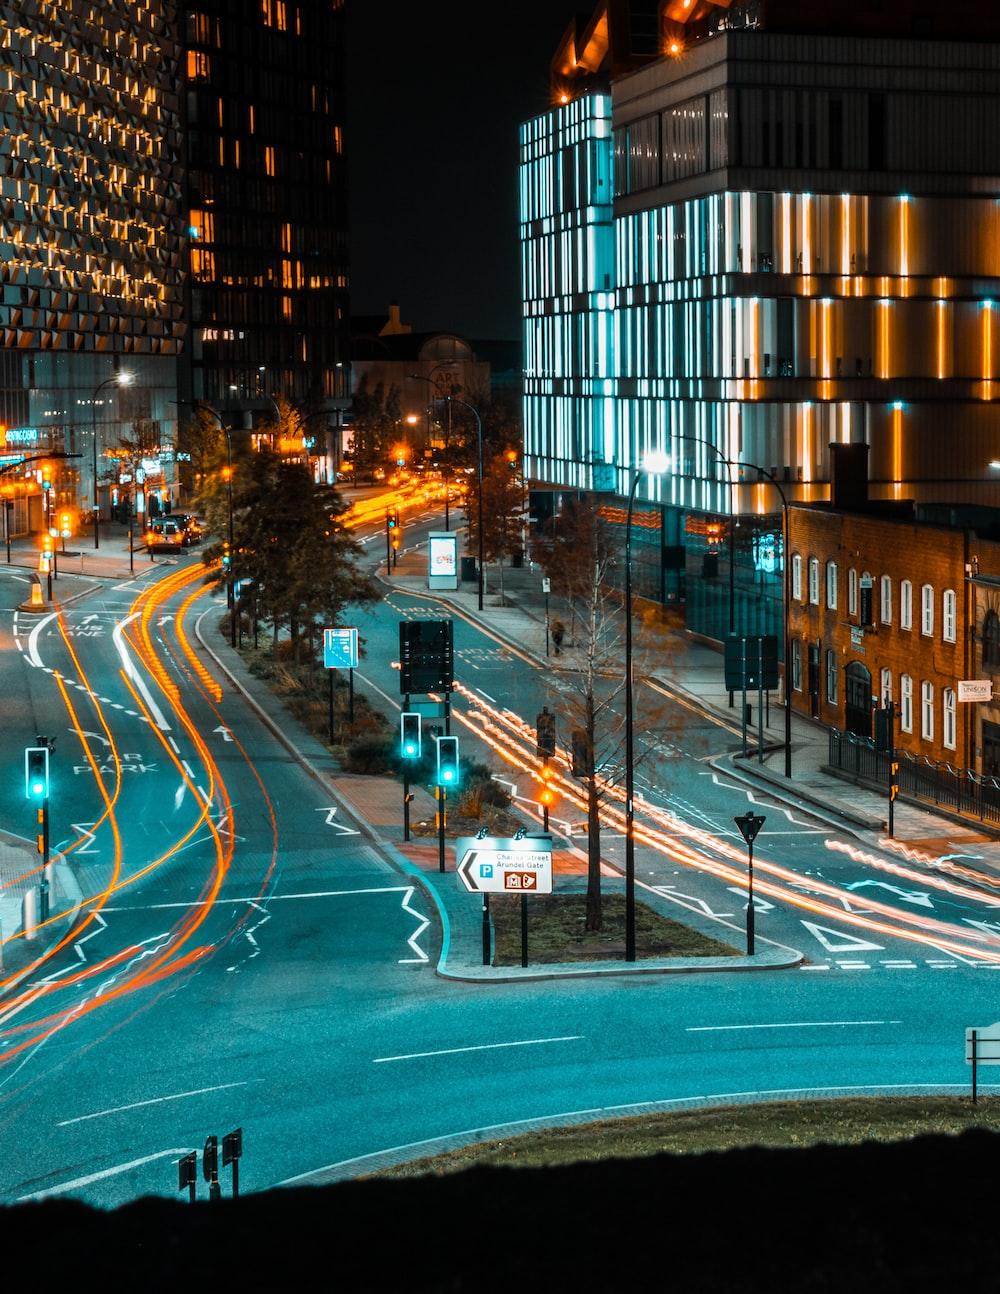 time lapse photo of street light